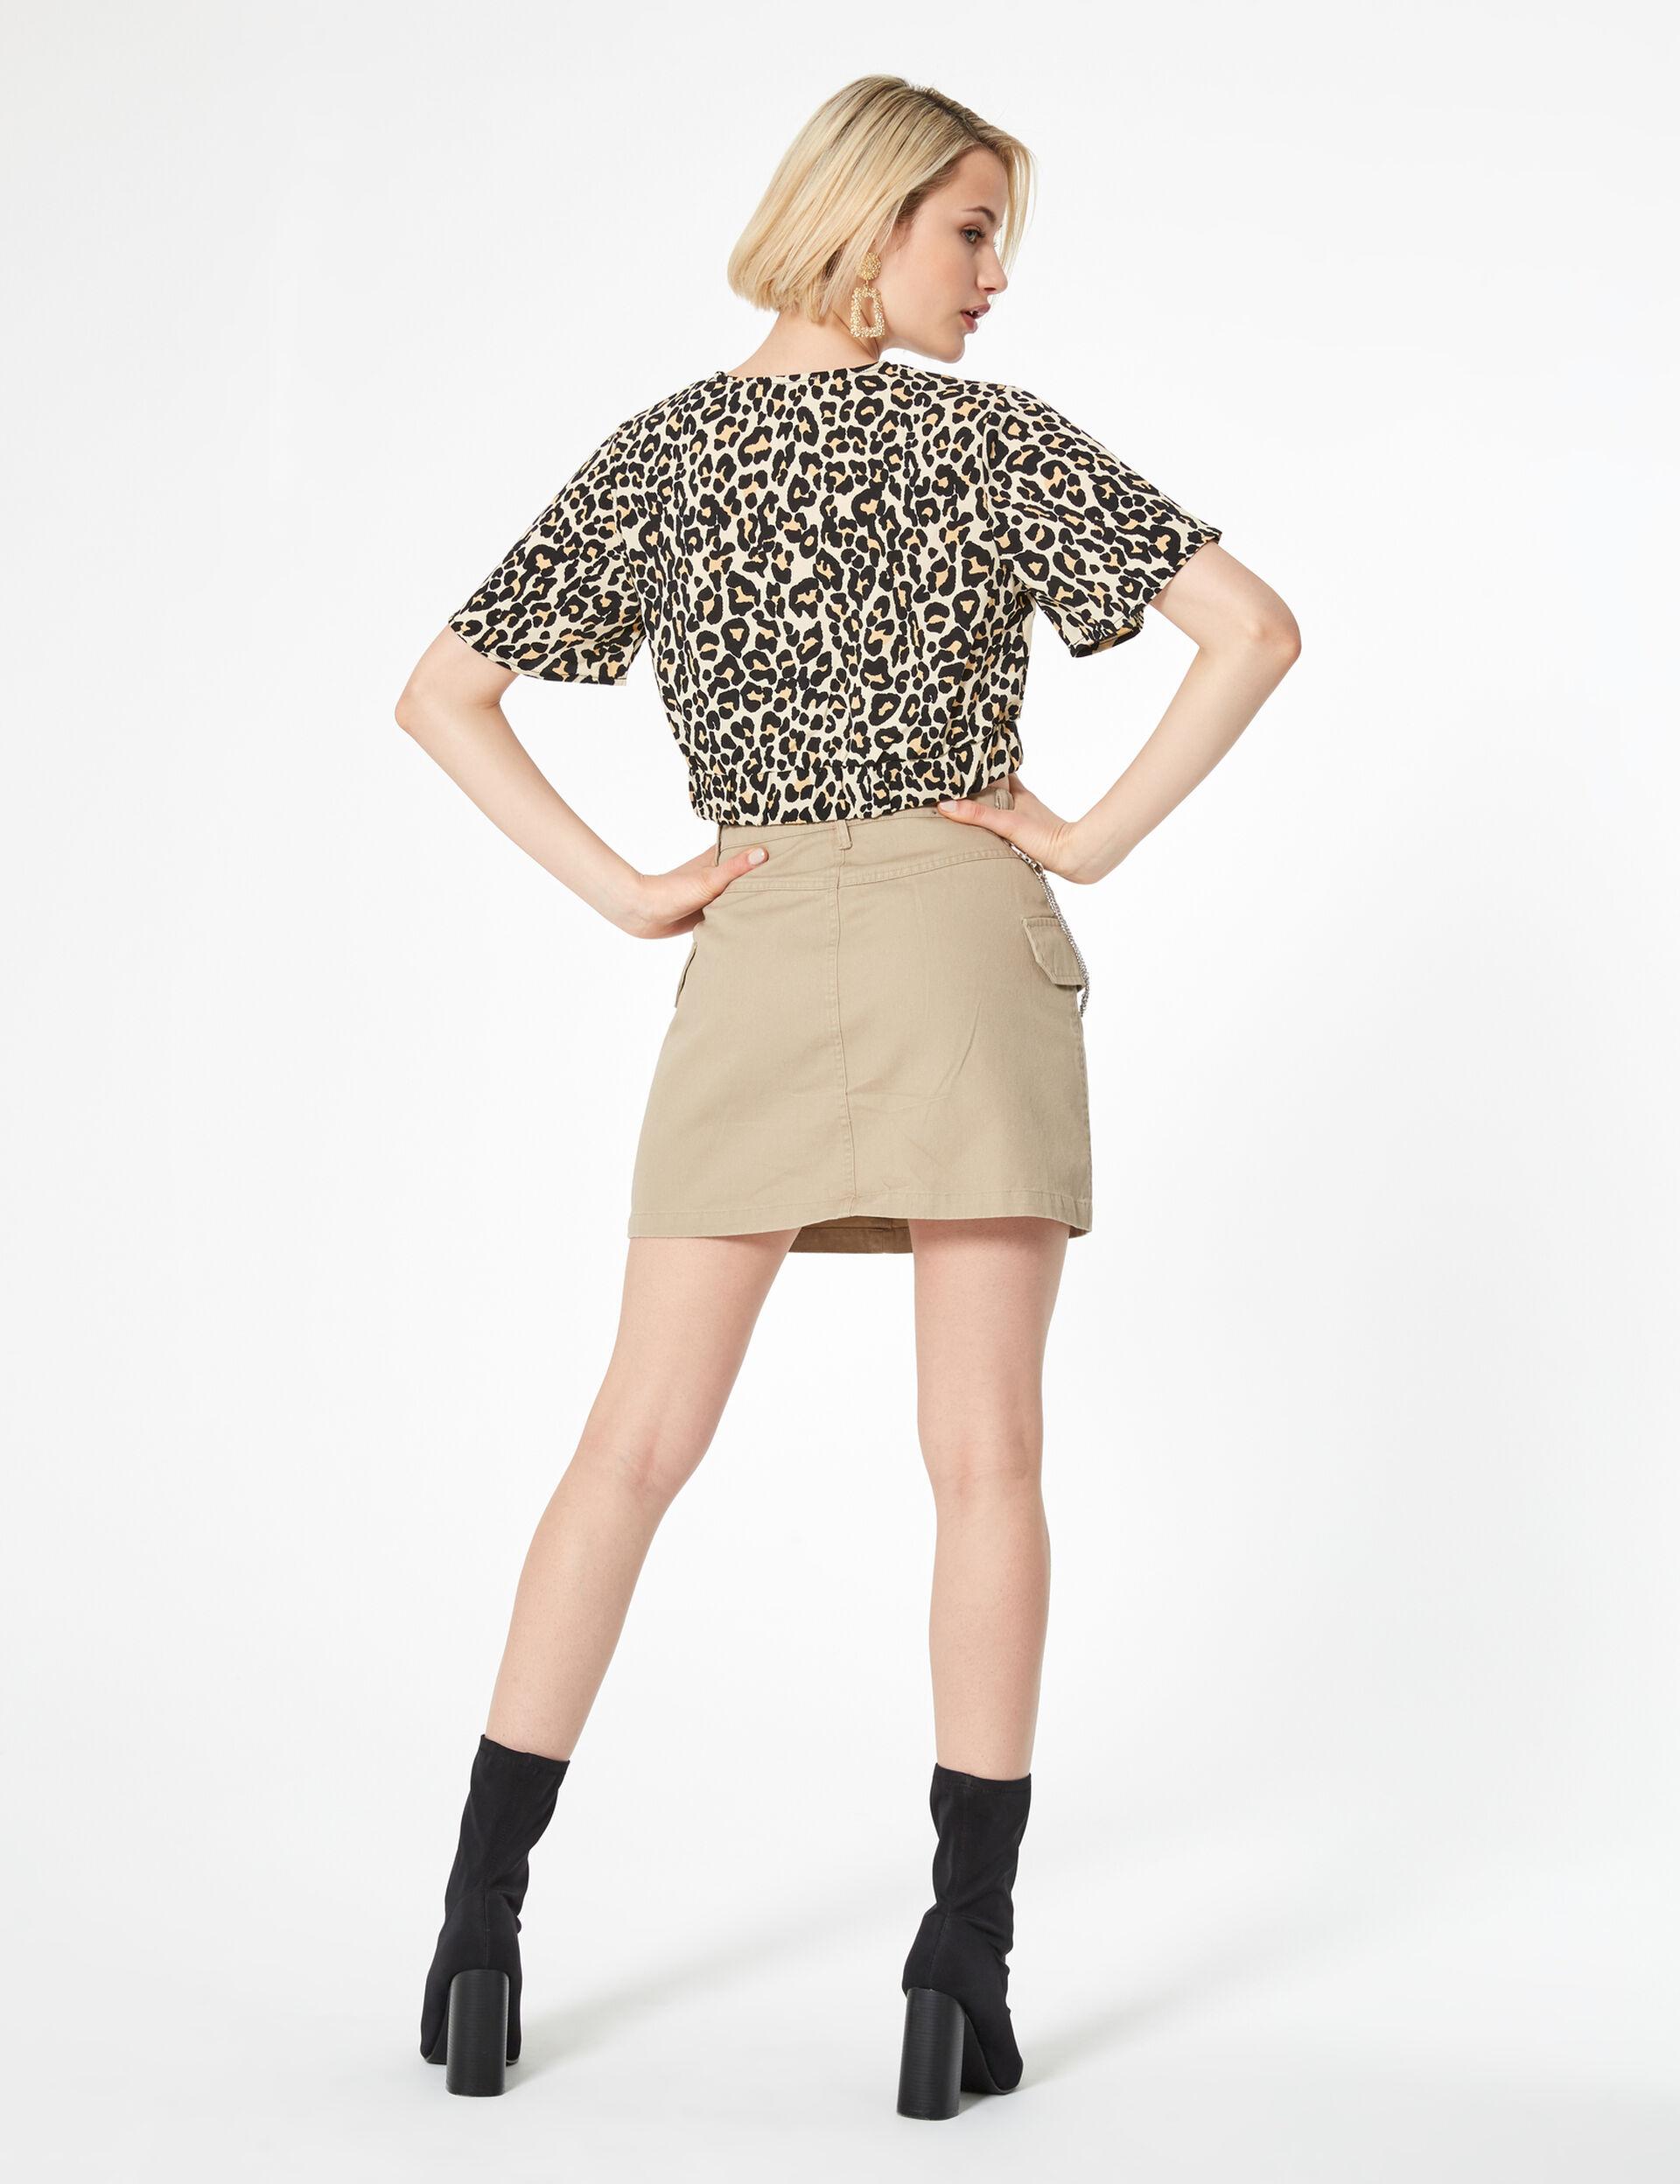 Beige and black leopard print wrap blouse